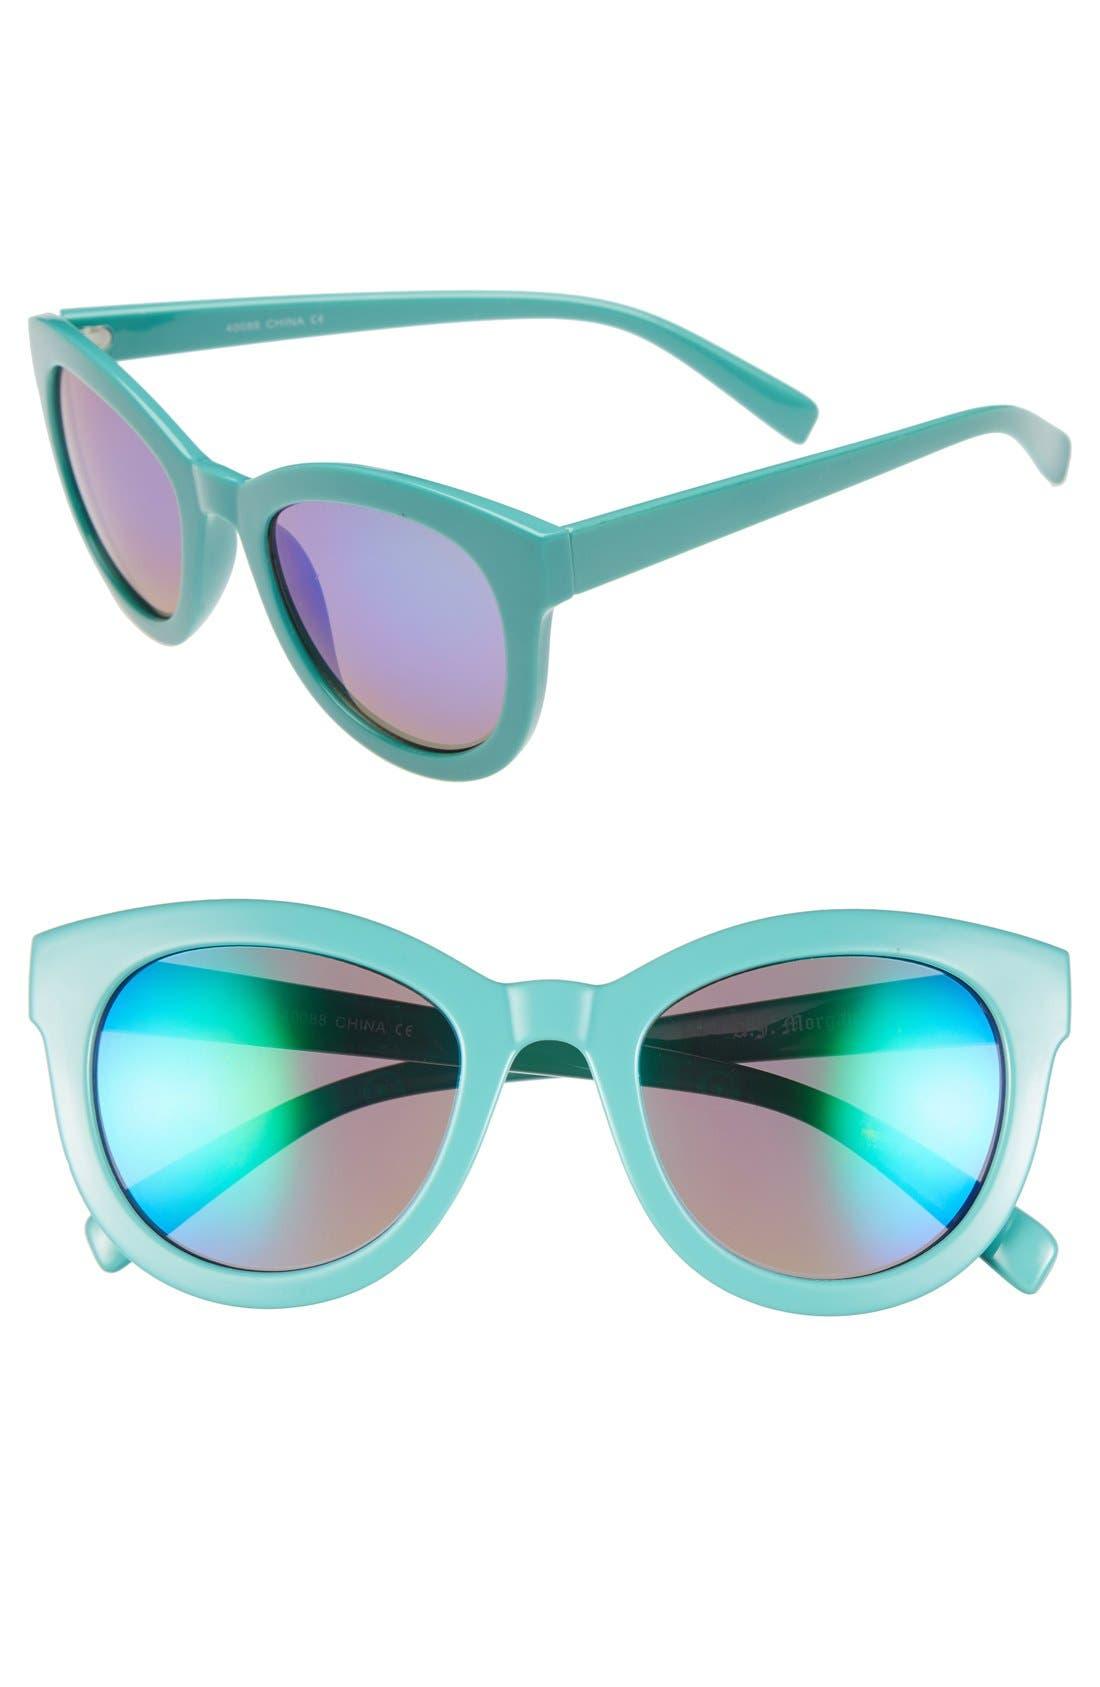 Main Image - A.J Morgan 'Hatch' 50mm Sunglasses